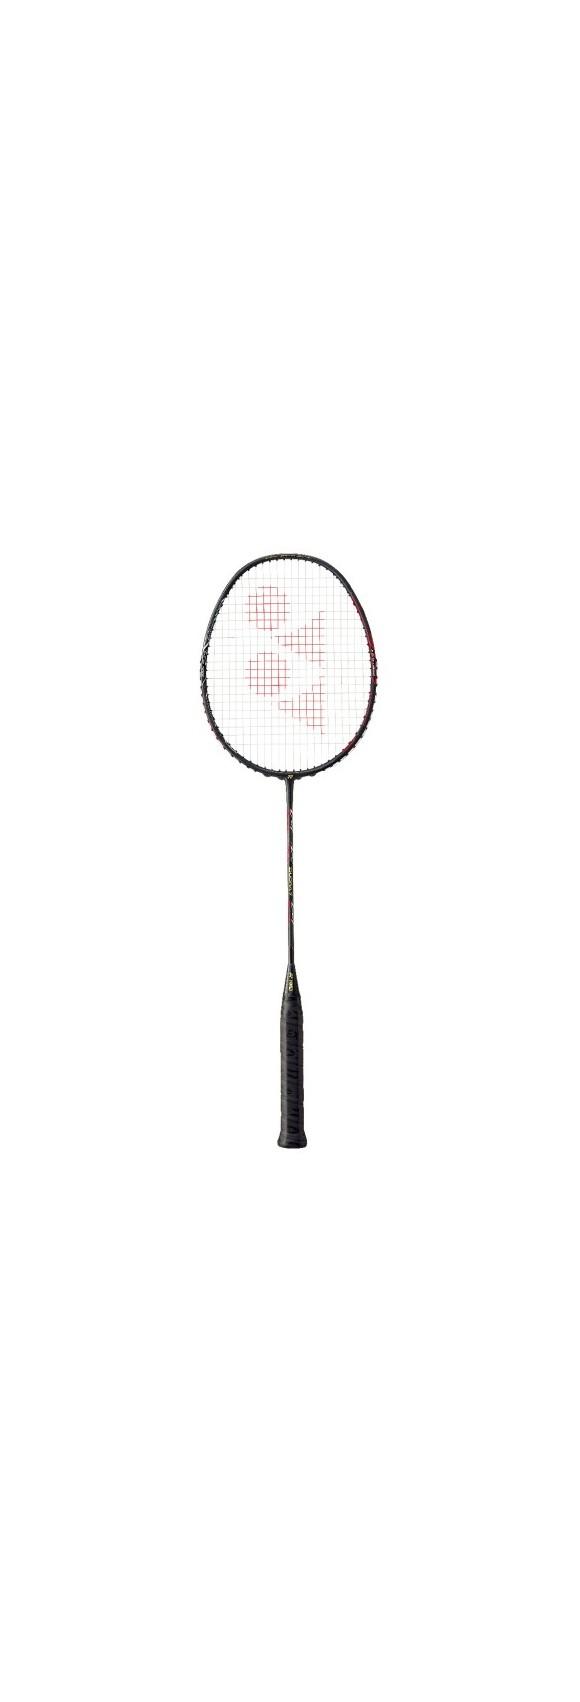 Yonex Duora 7 Black Badminton Racket (3U4G)